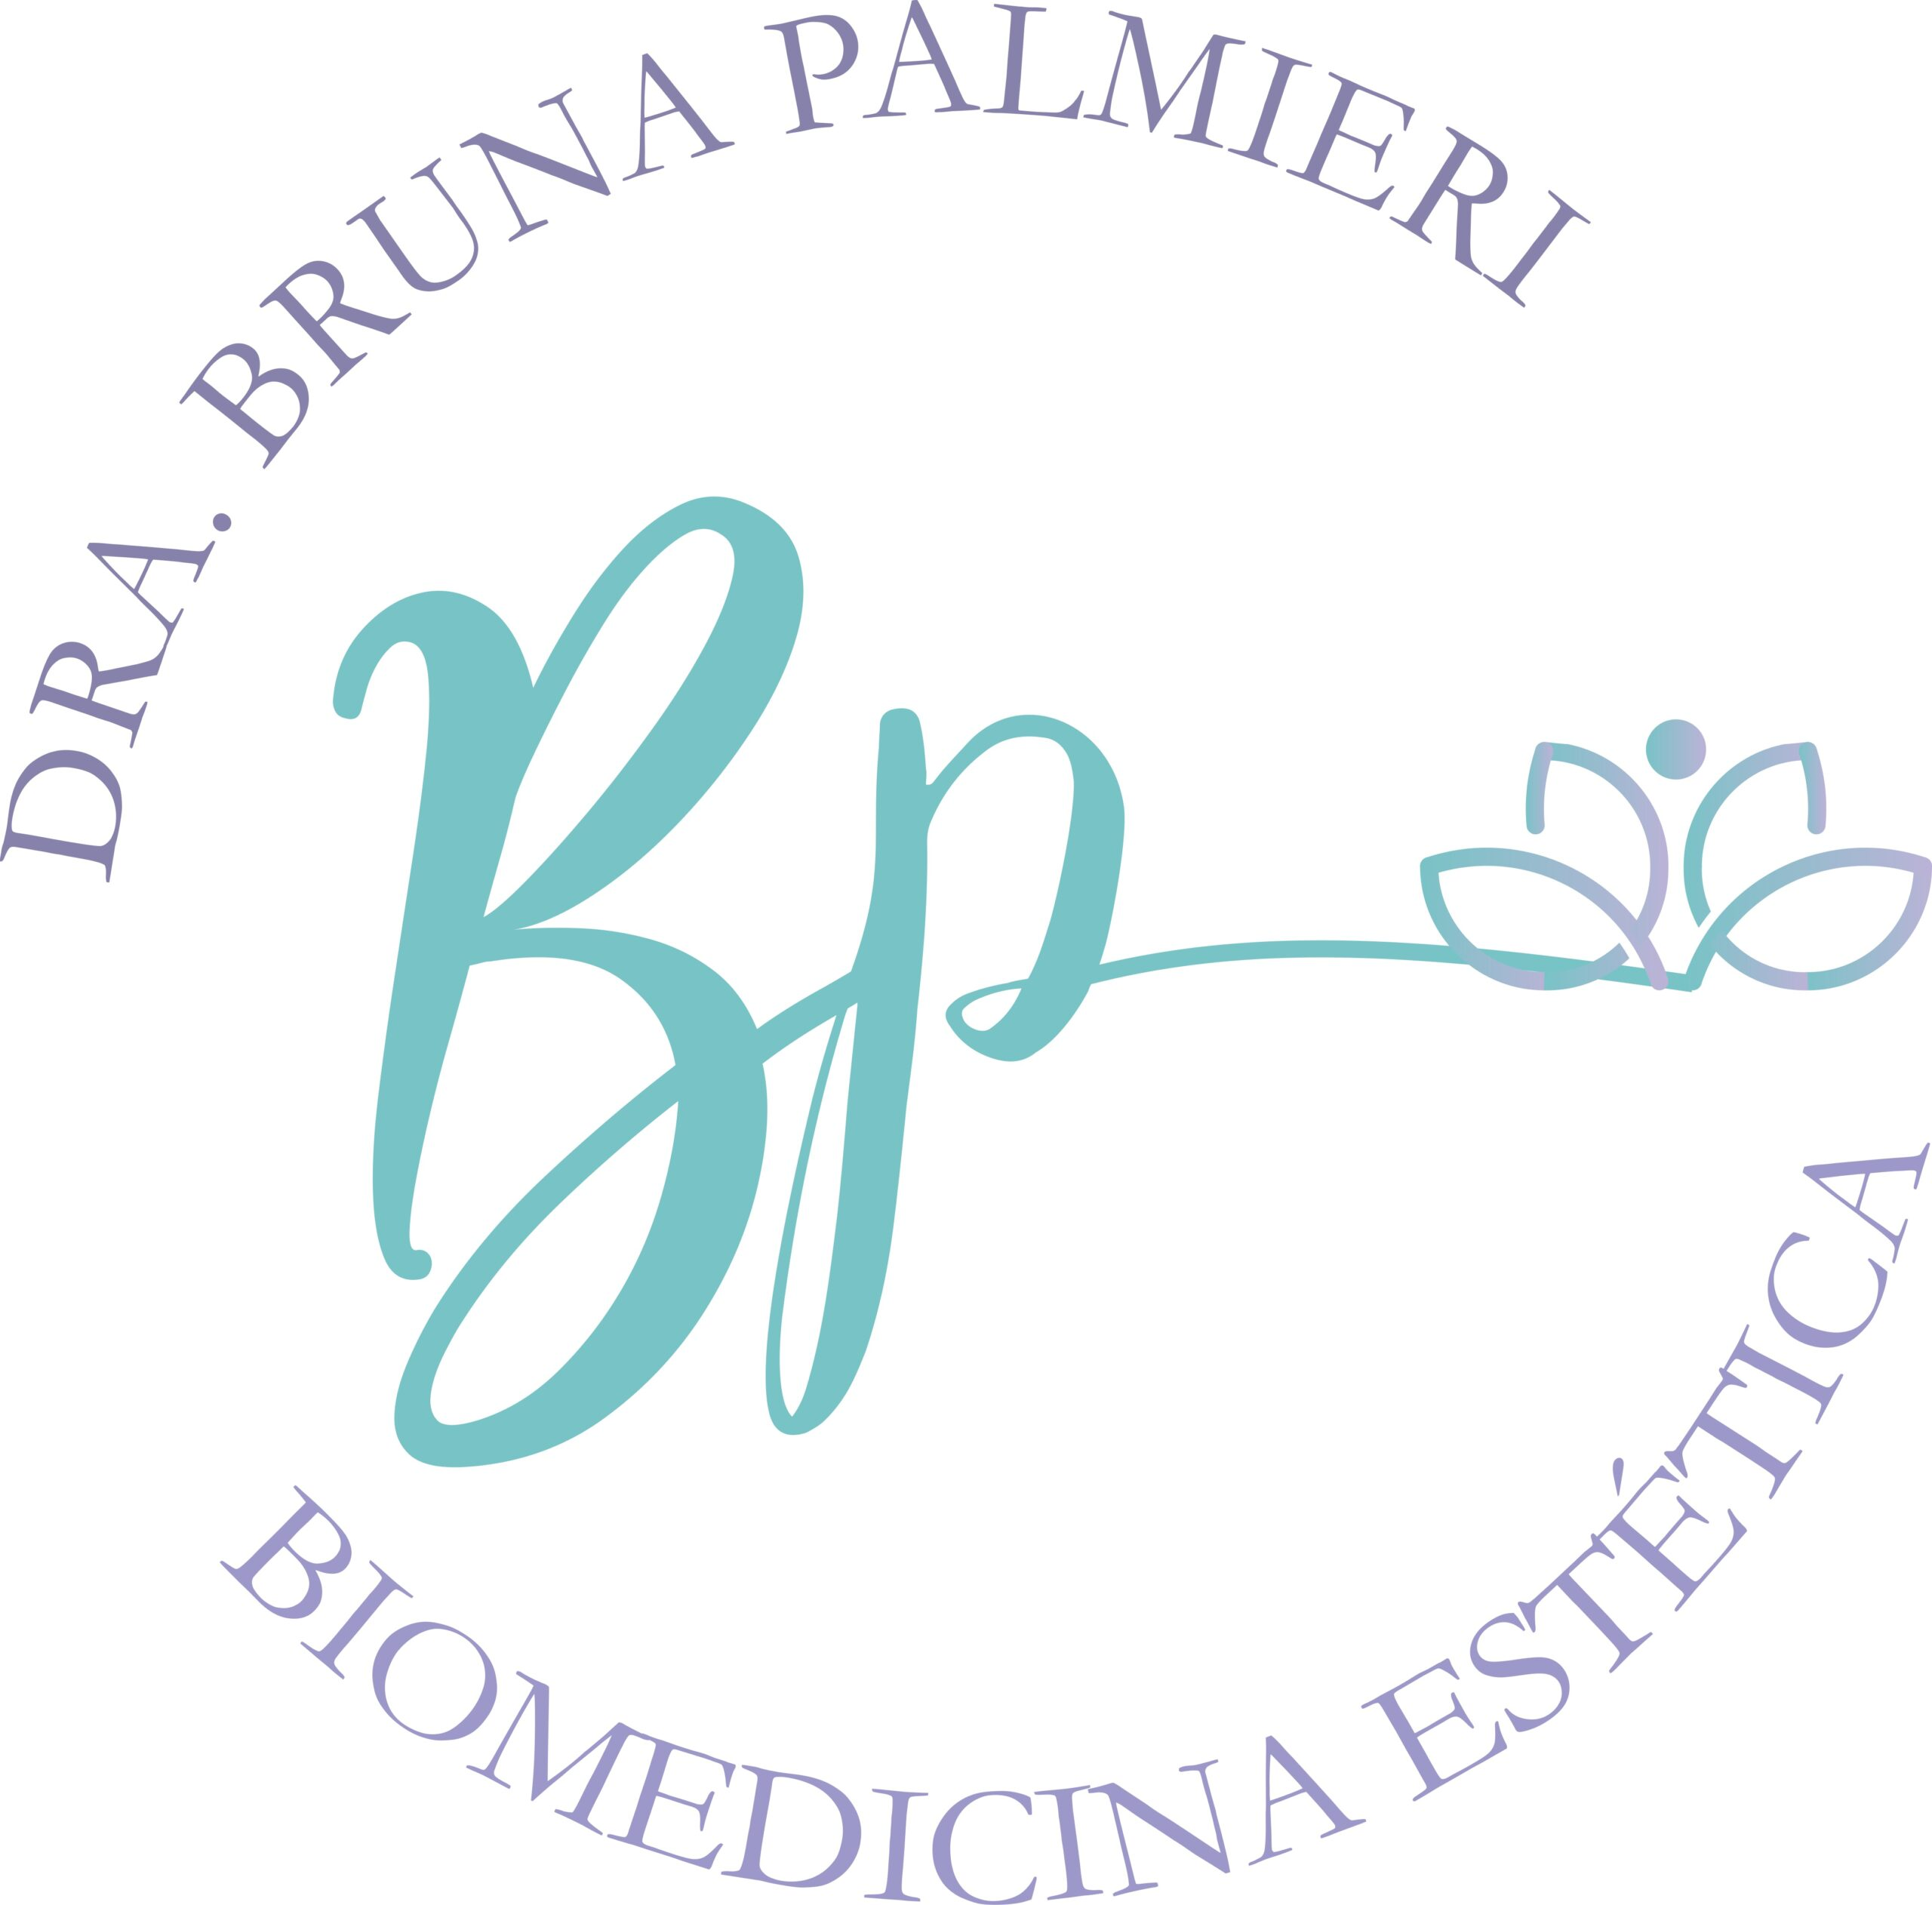 Dra. Bruna Palmieri Biomedicina Estética